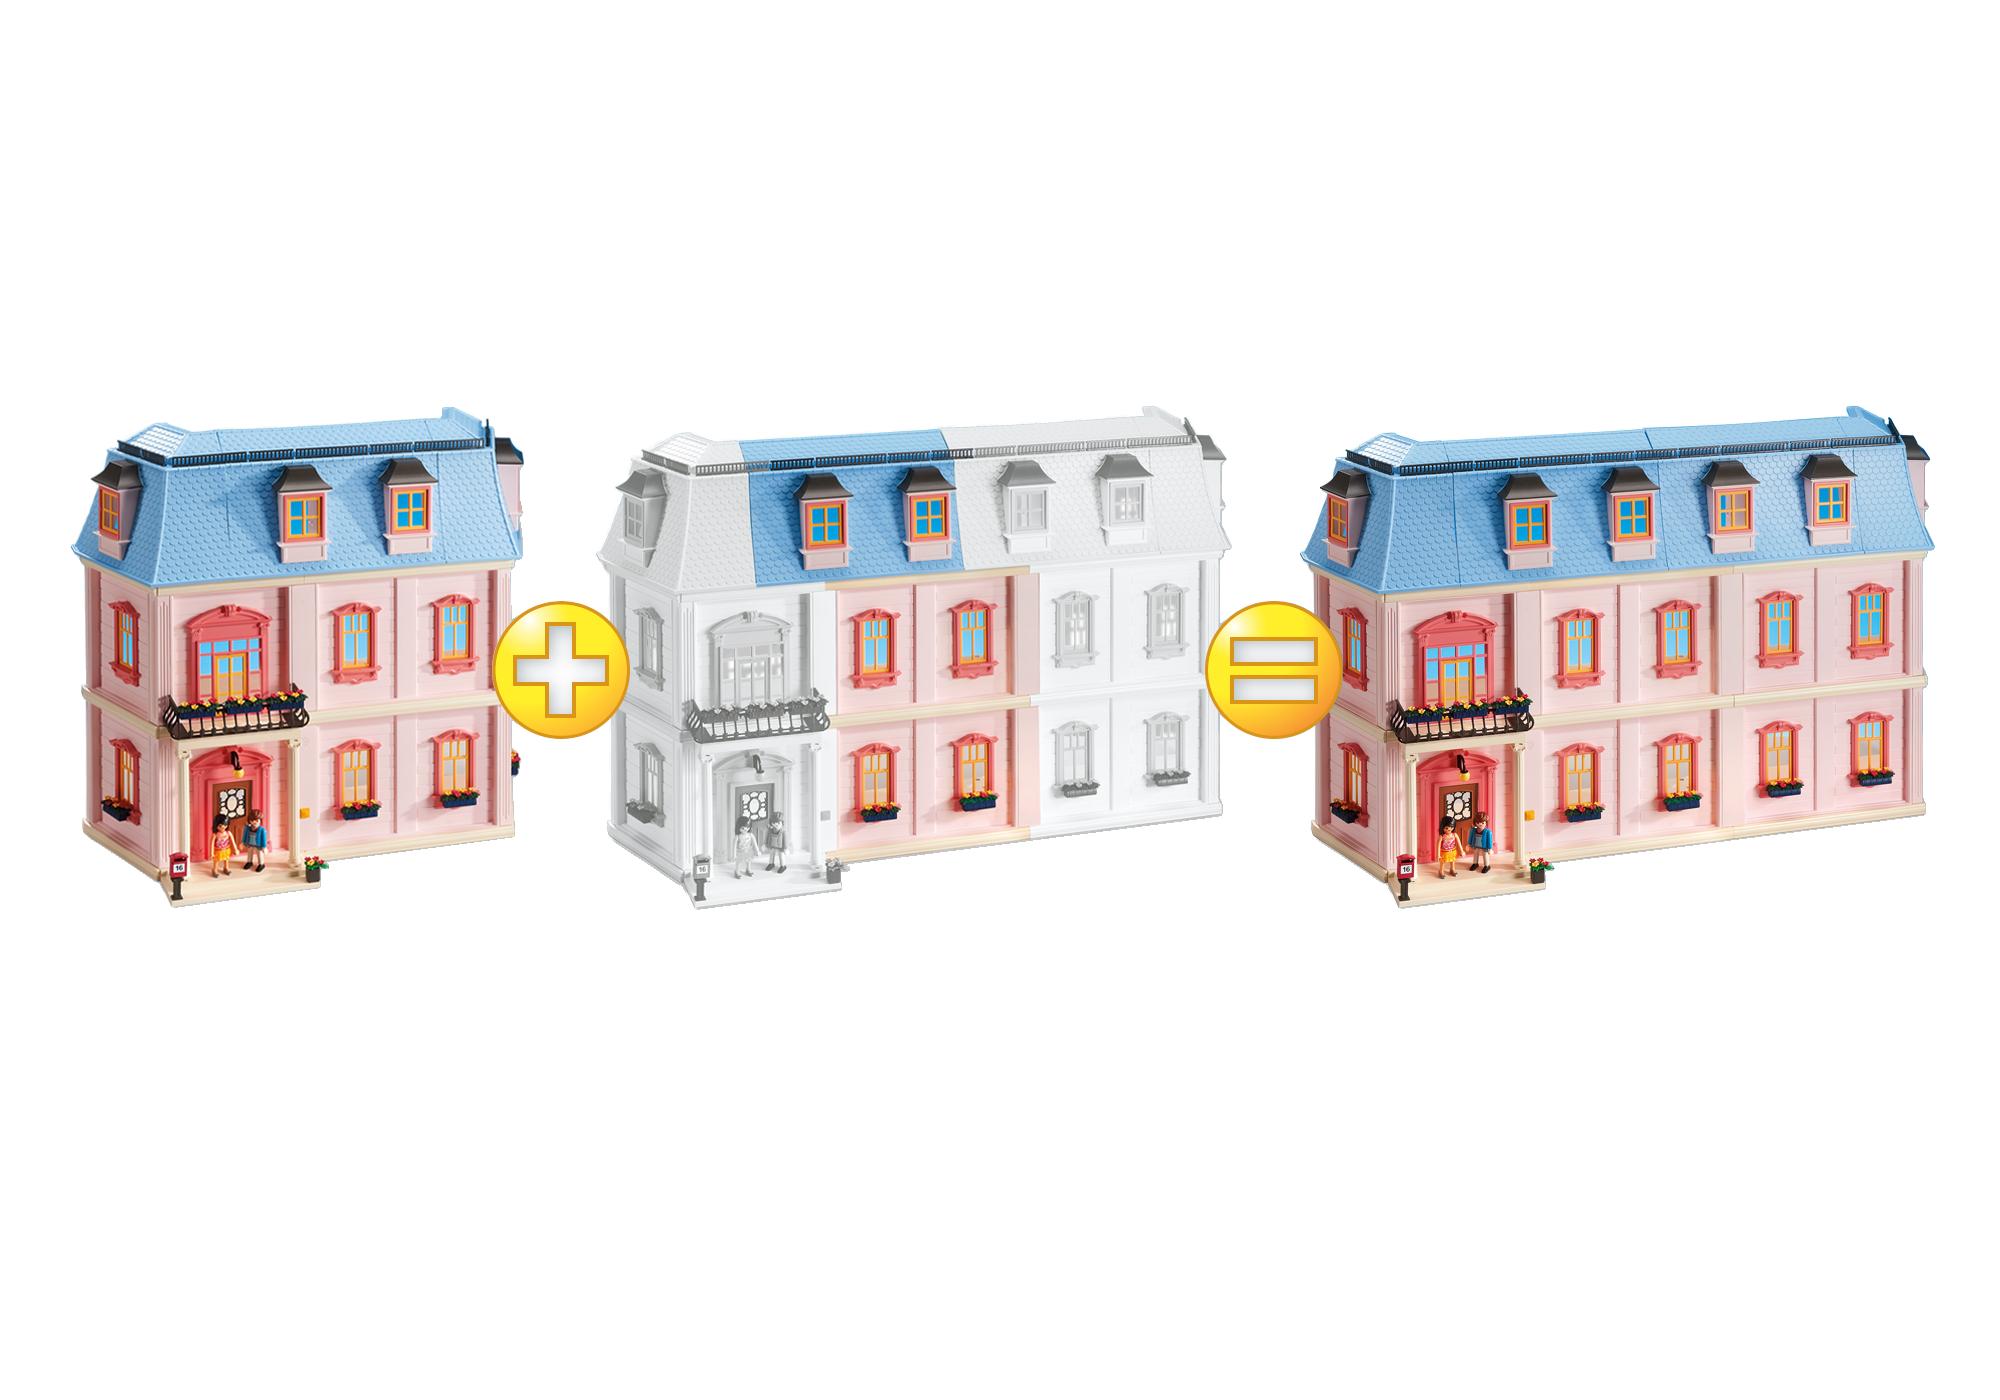 http://media.playmobil.com/i/playmobil/6452_product_extra1/Romantisk dukkehus udvidelse A